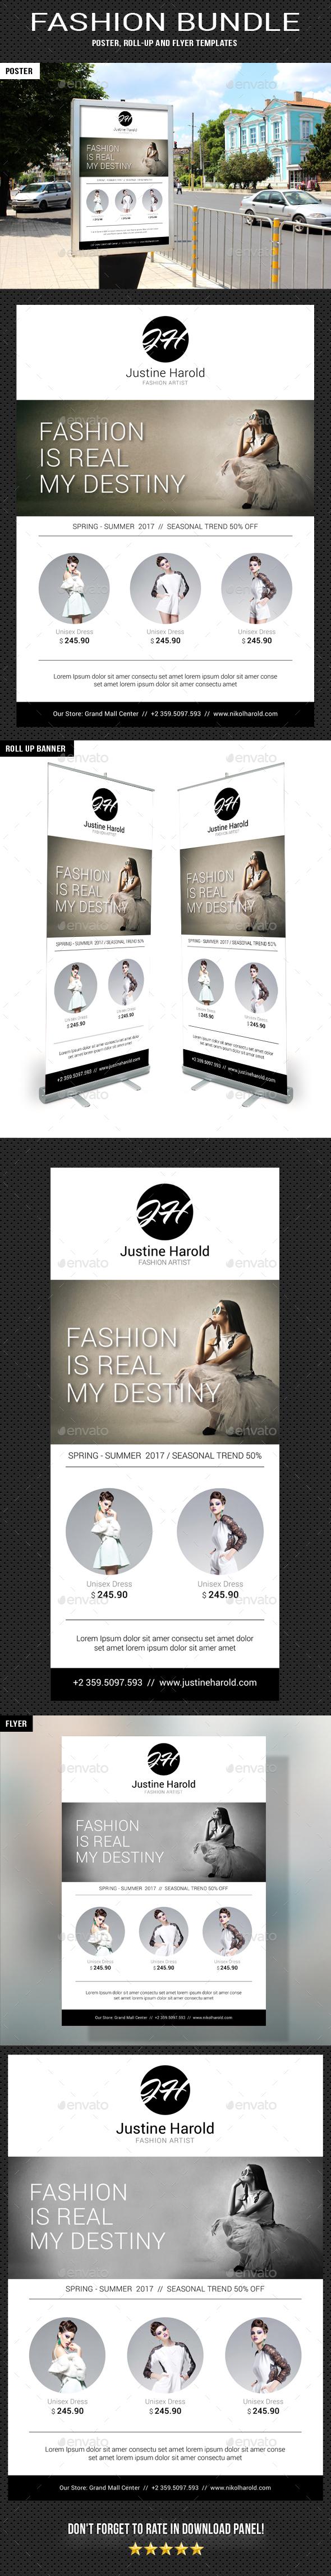 3 Fashion Poster Flyer Banner Bundle - Signage Print Templates